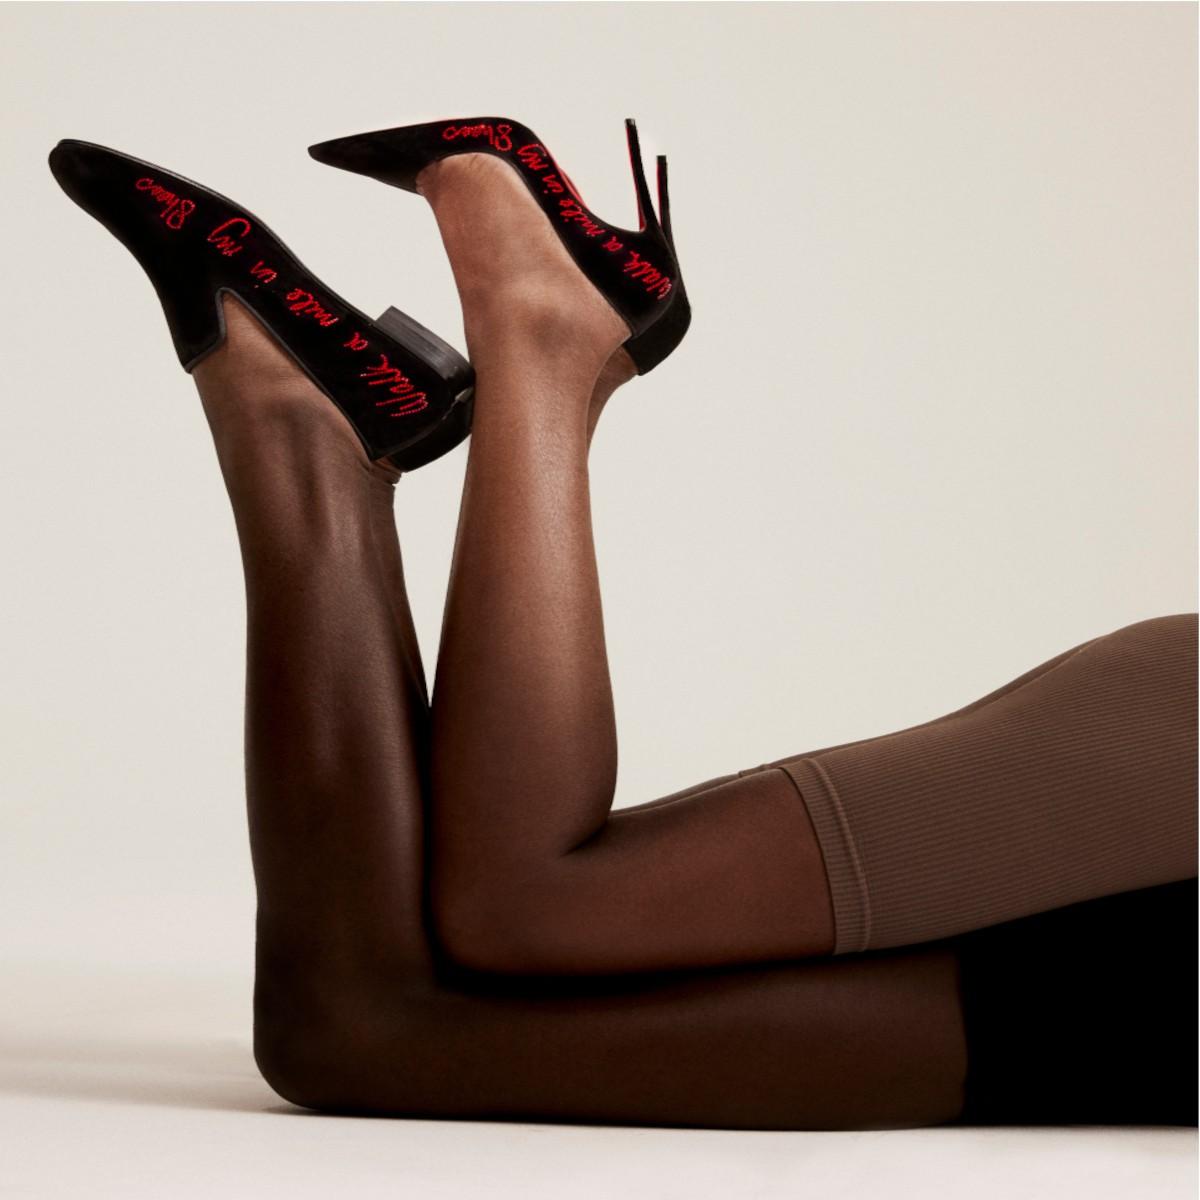 Shoes - Free Walkee - Christian Louboutin